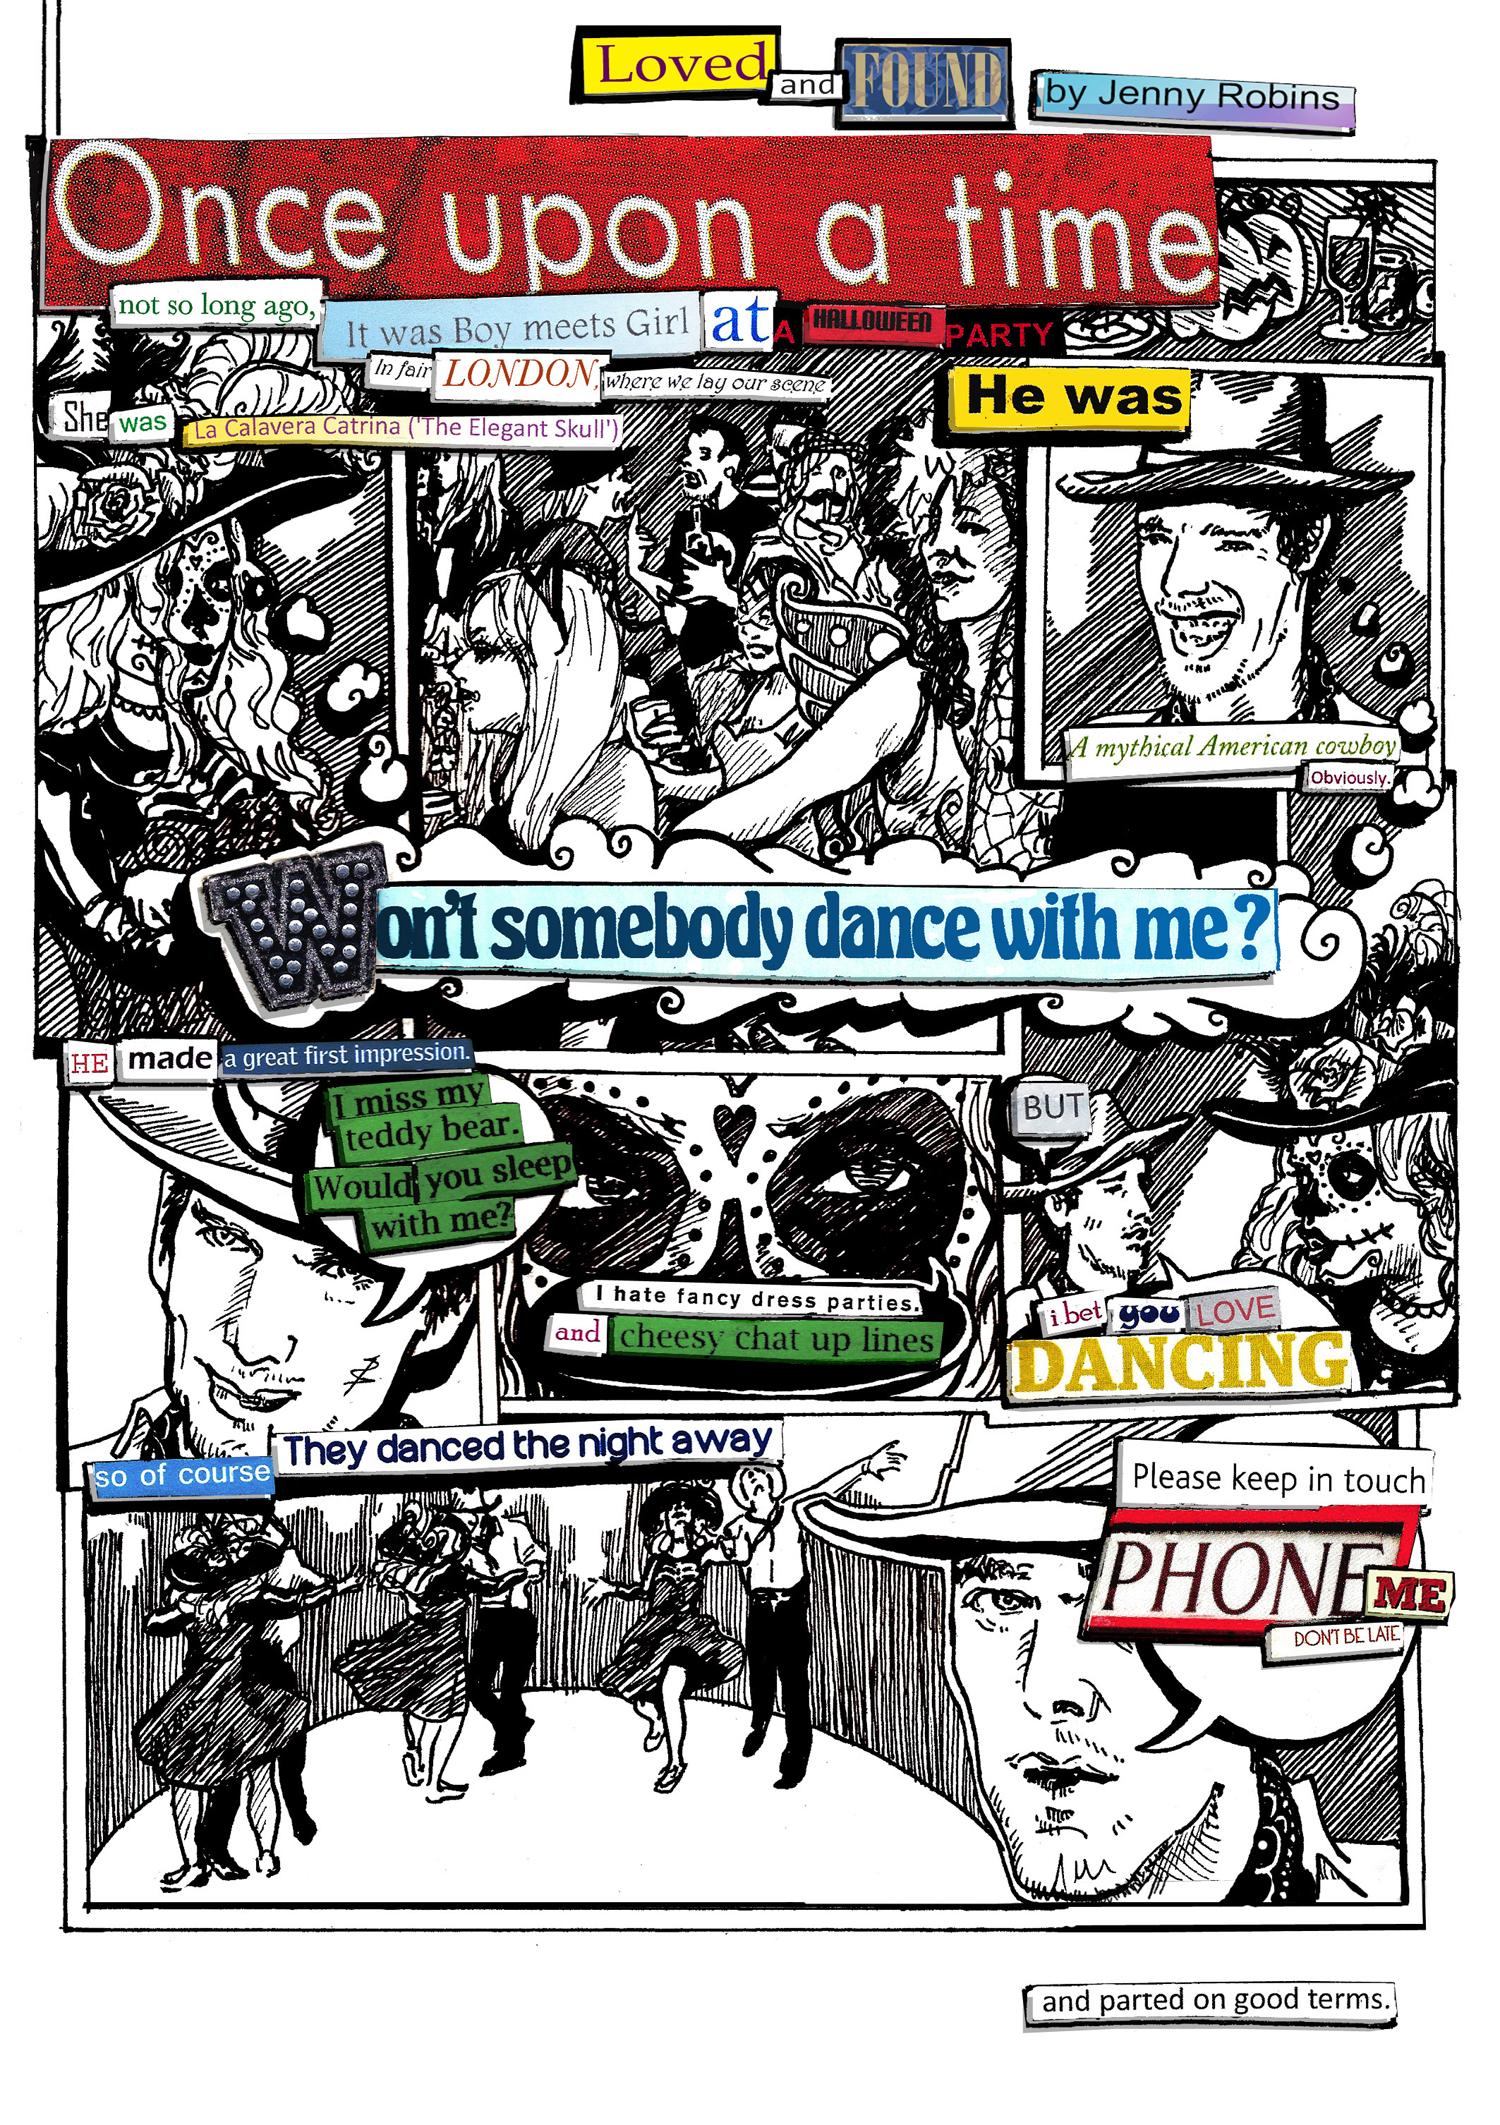 jenny robins - found text comic - page 1 final